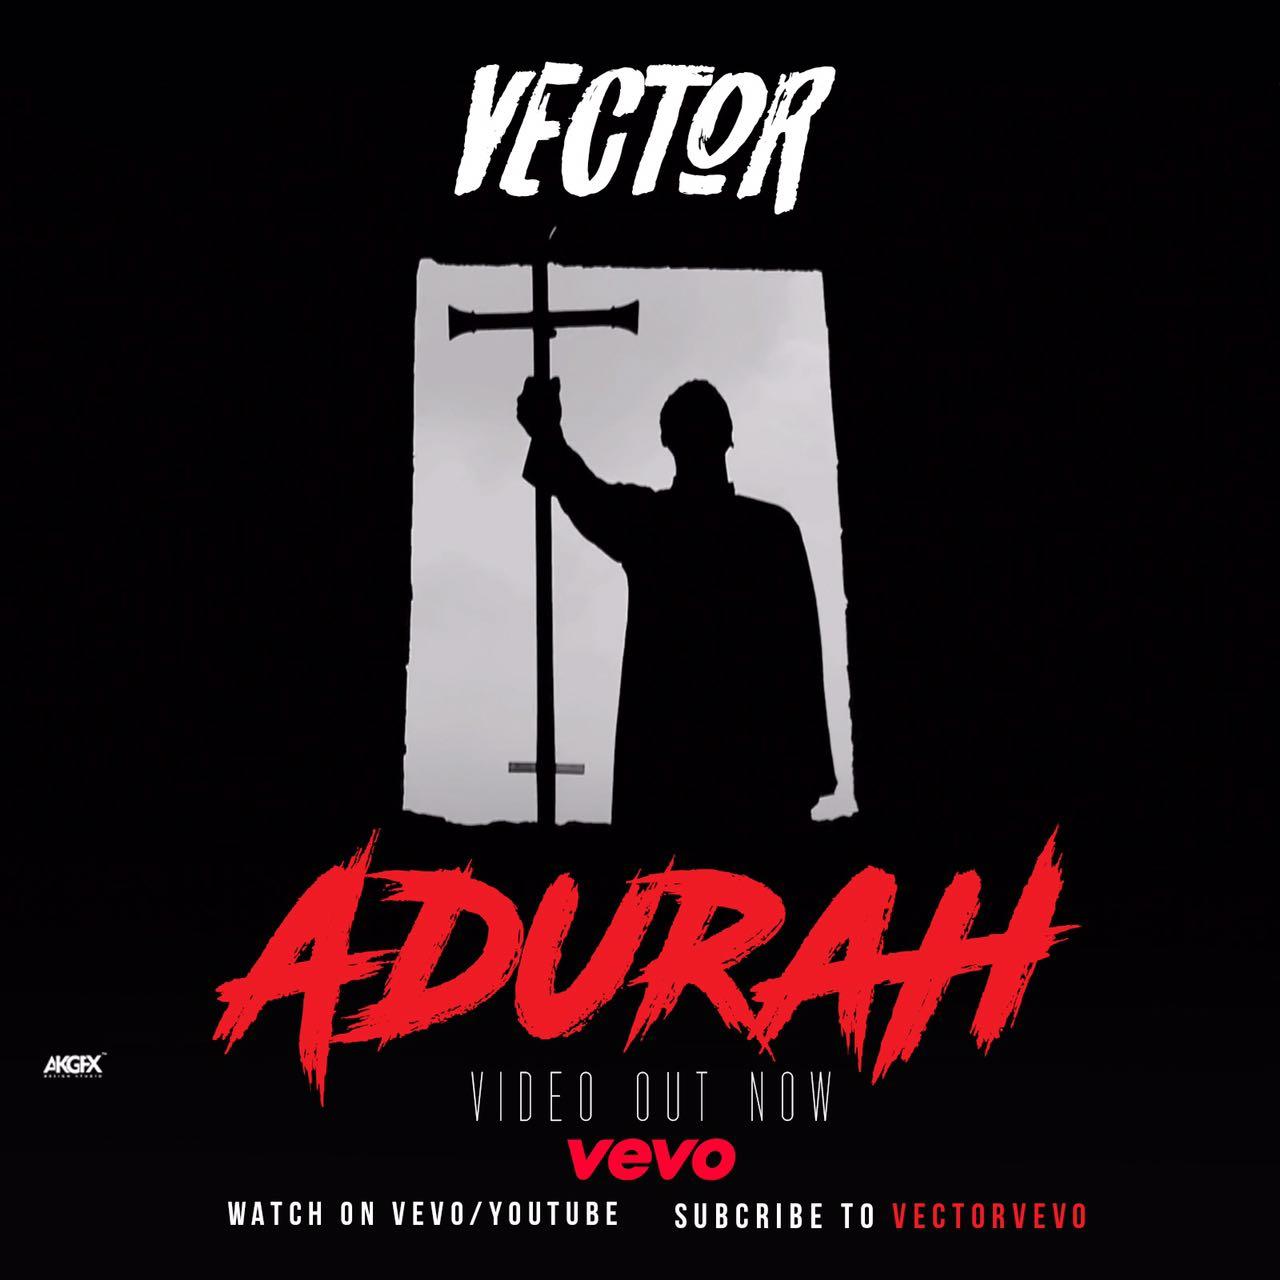 VIDEO: Vector - Adurah (Official Release)